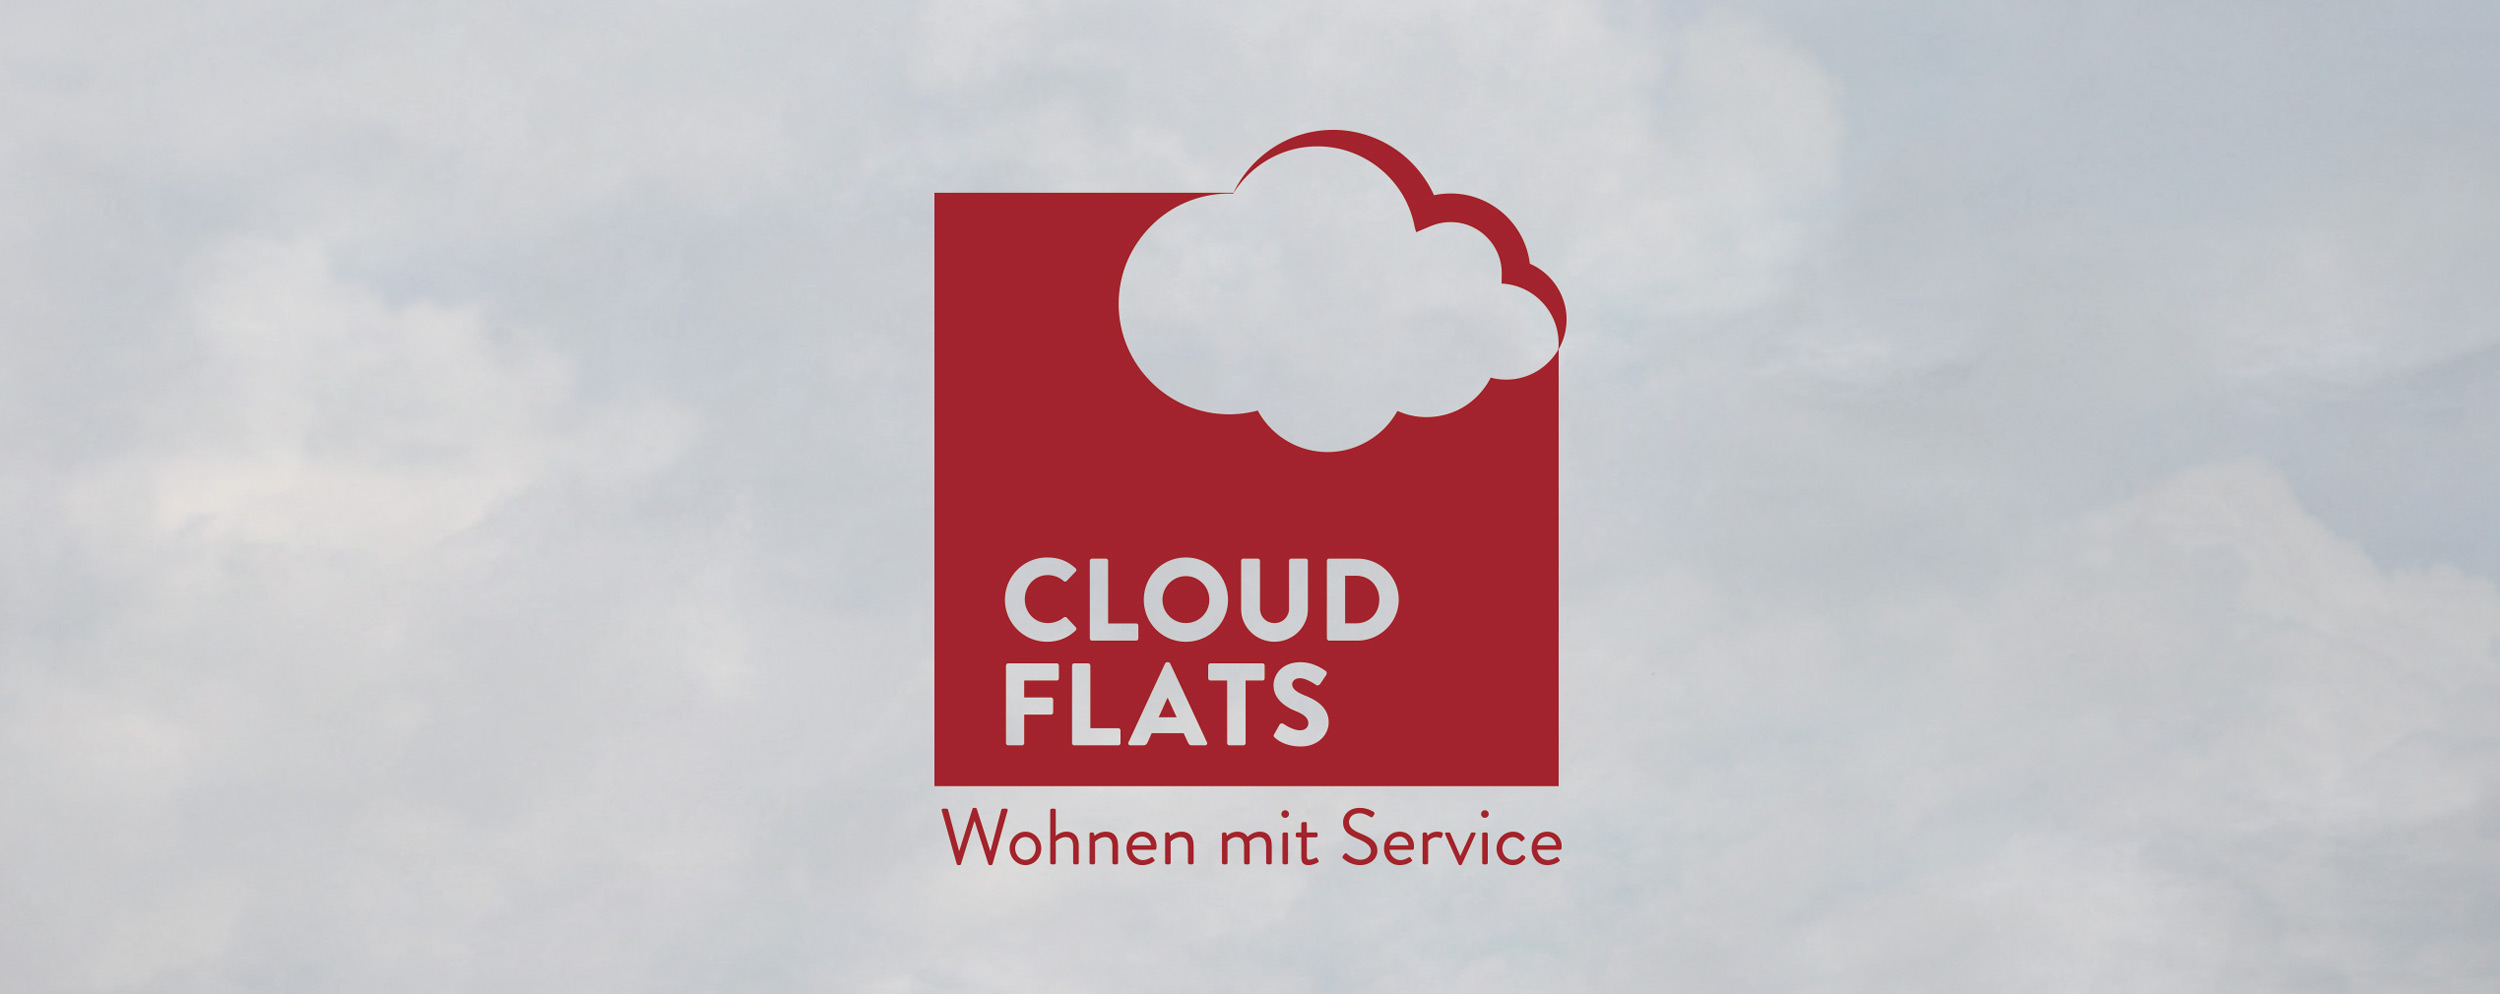 Cloudflats brand by GPU Design